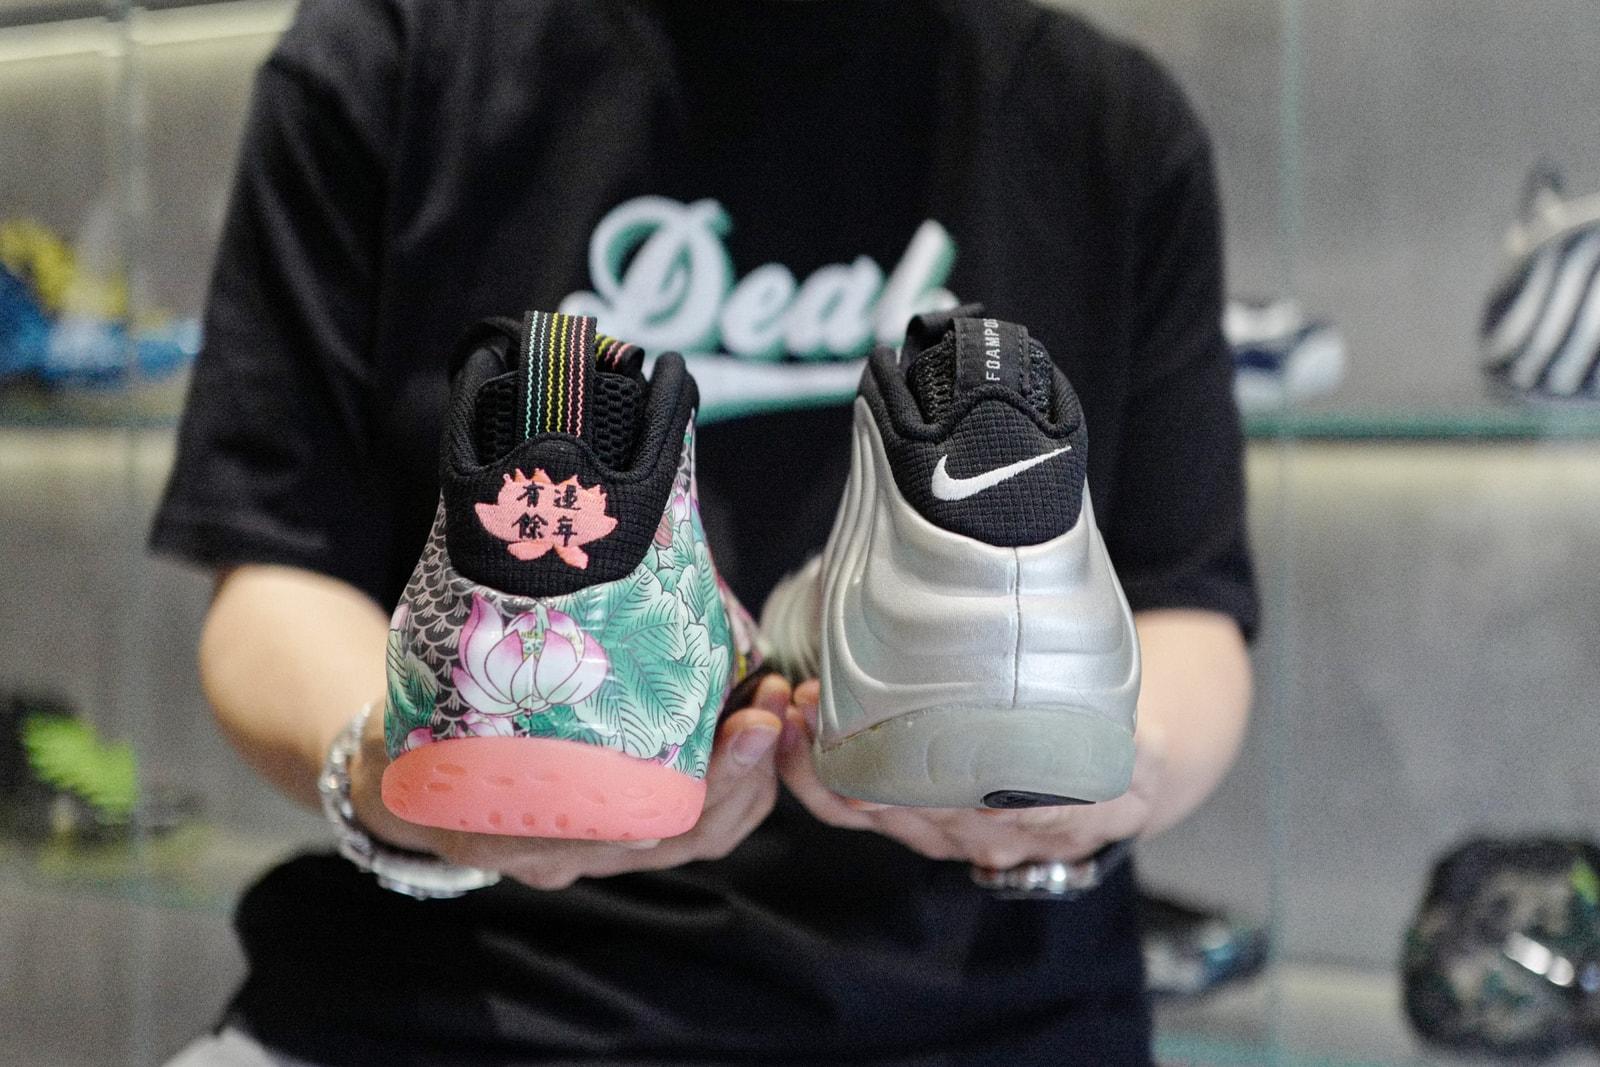 天津 COLOUR 創始人葉春與 Nike Air Foamposite One 的紐帶與淵源 | Sole Mates